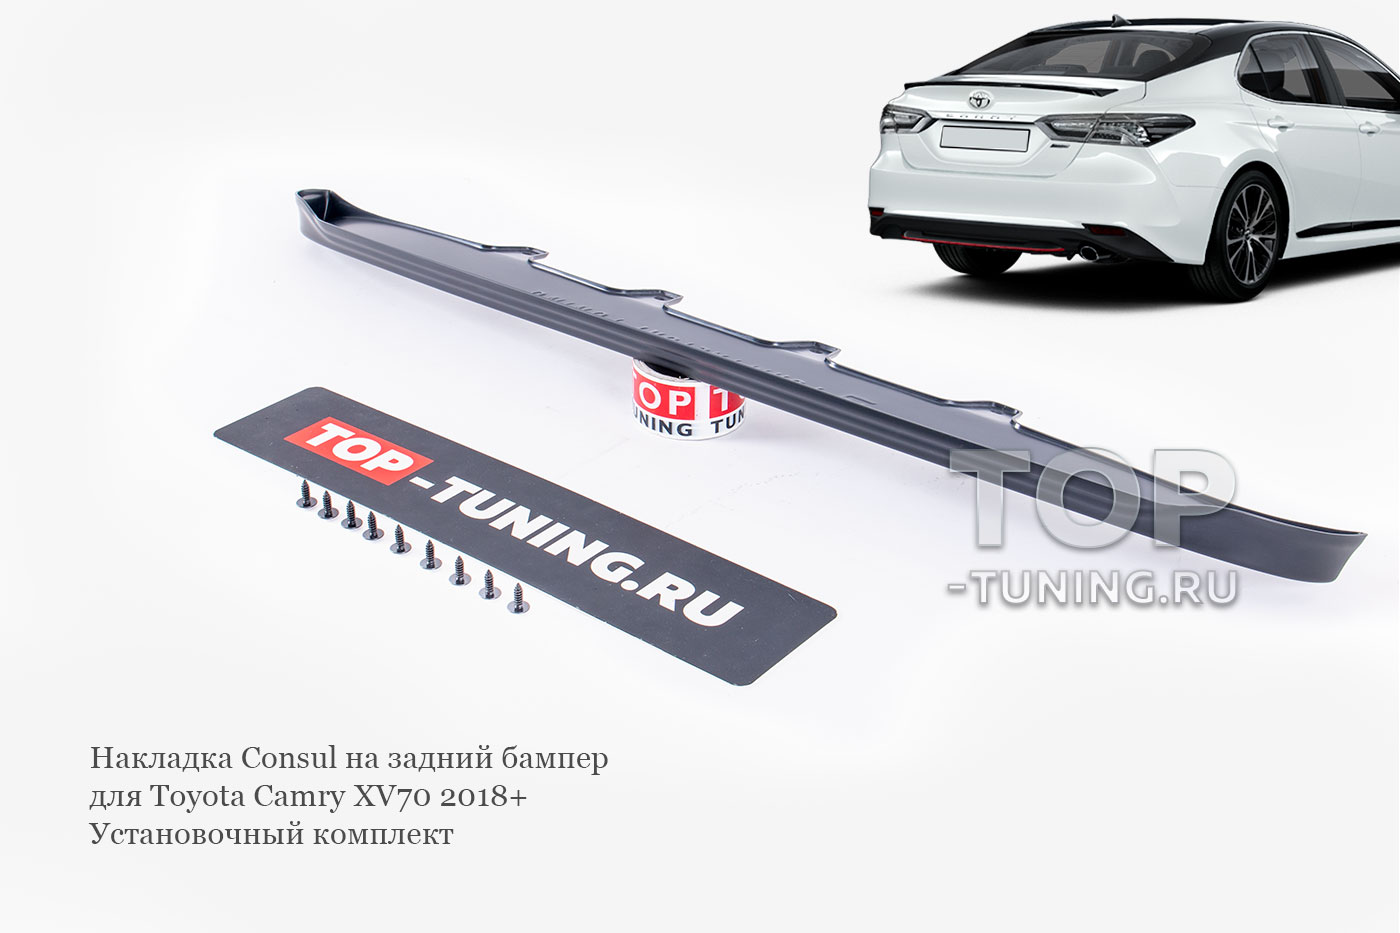 Тюнинг Камри 70 - S-Edition накладка на задний бампер